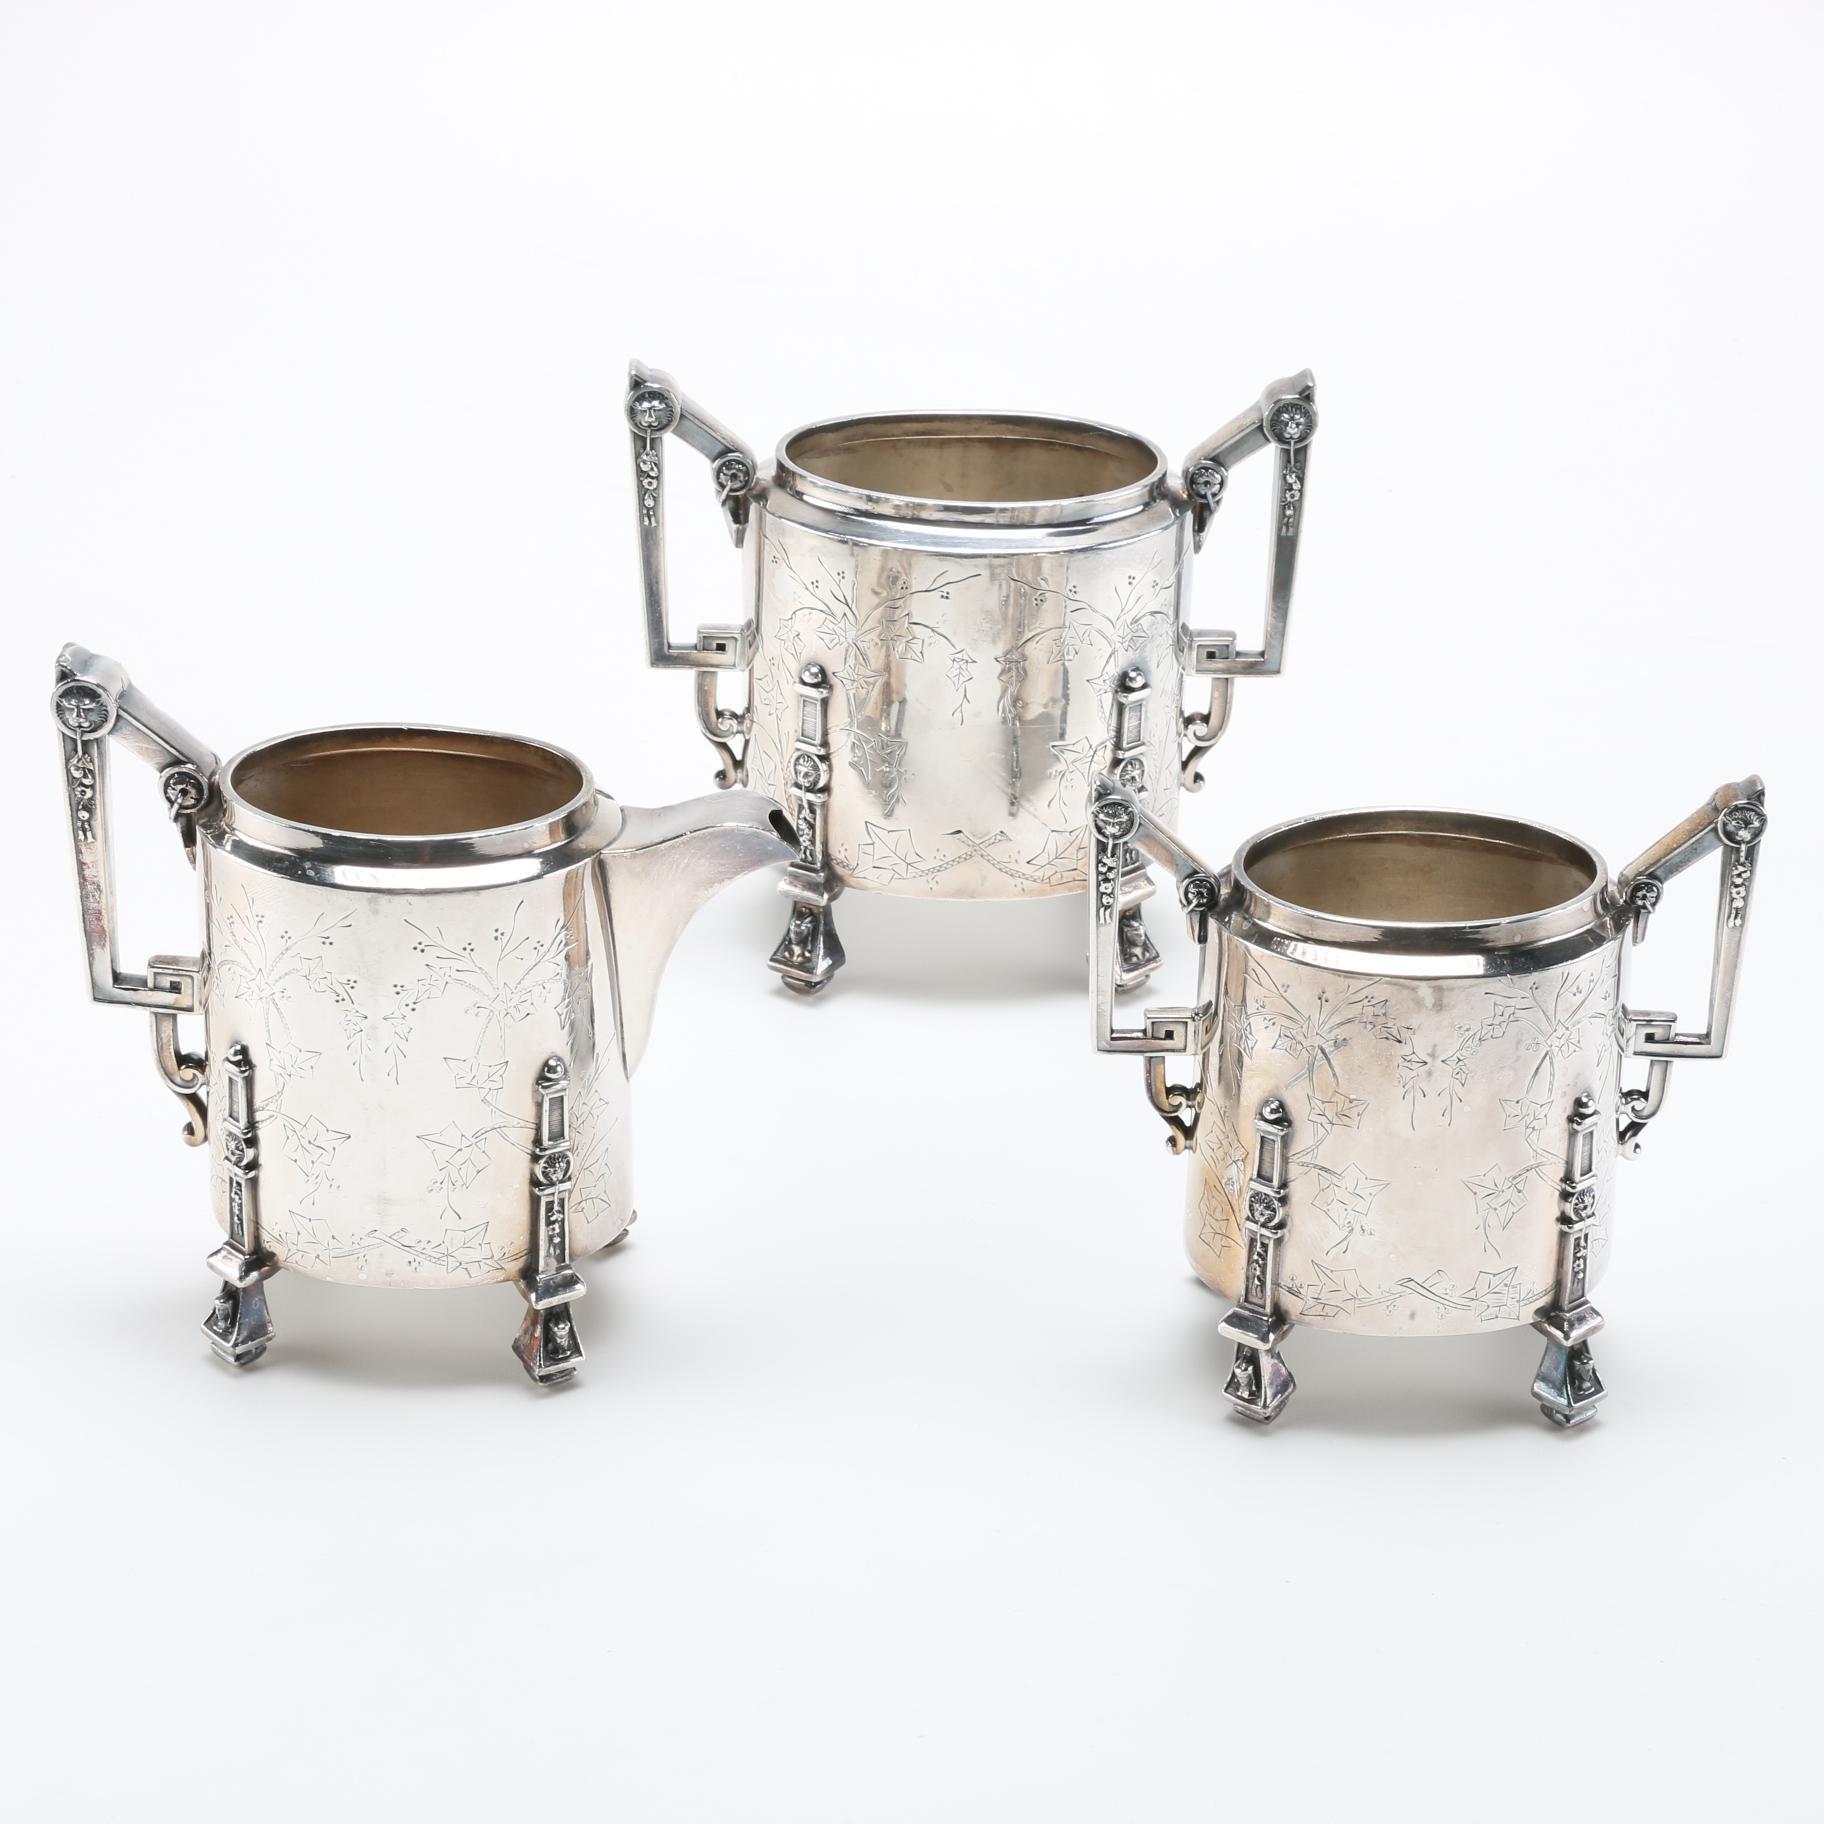 Antique Reed & Barton Silver Plate Creamer and Sugar Bowls